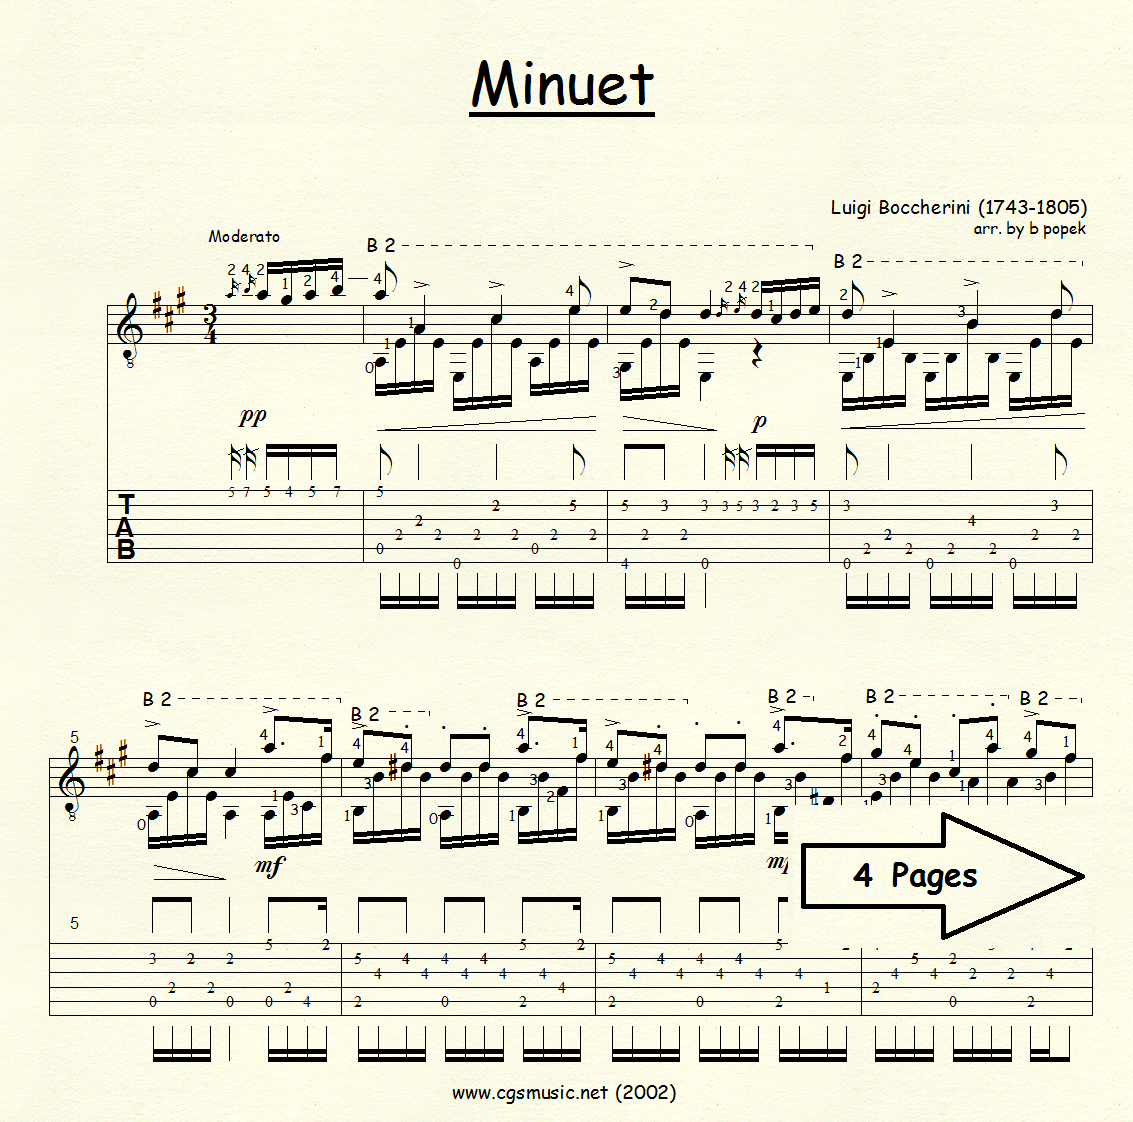 Minuet (Boccherini) for Classical Guitar in Tablature